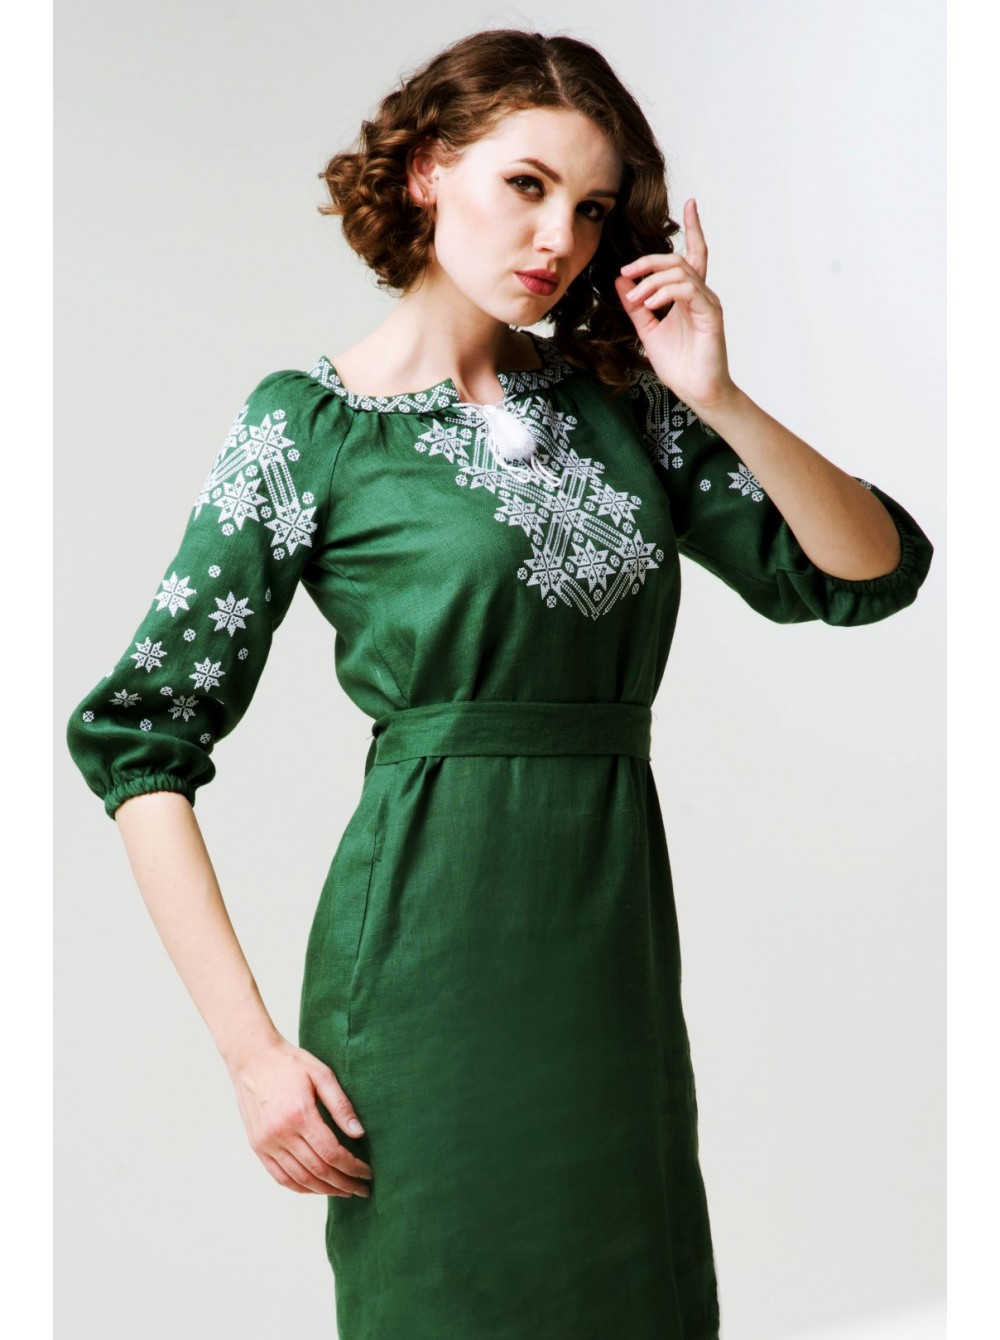 Зелена лляна сукня 3d3d2a82642d7